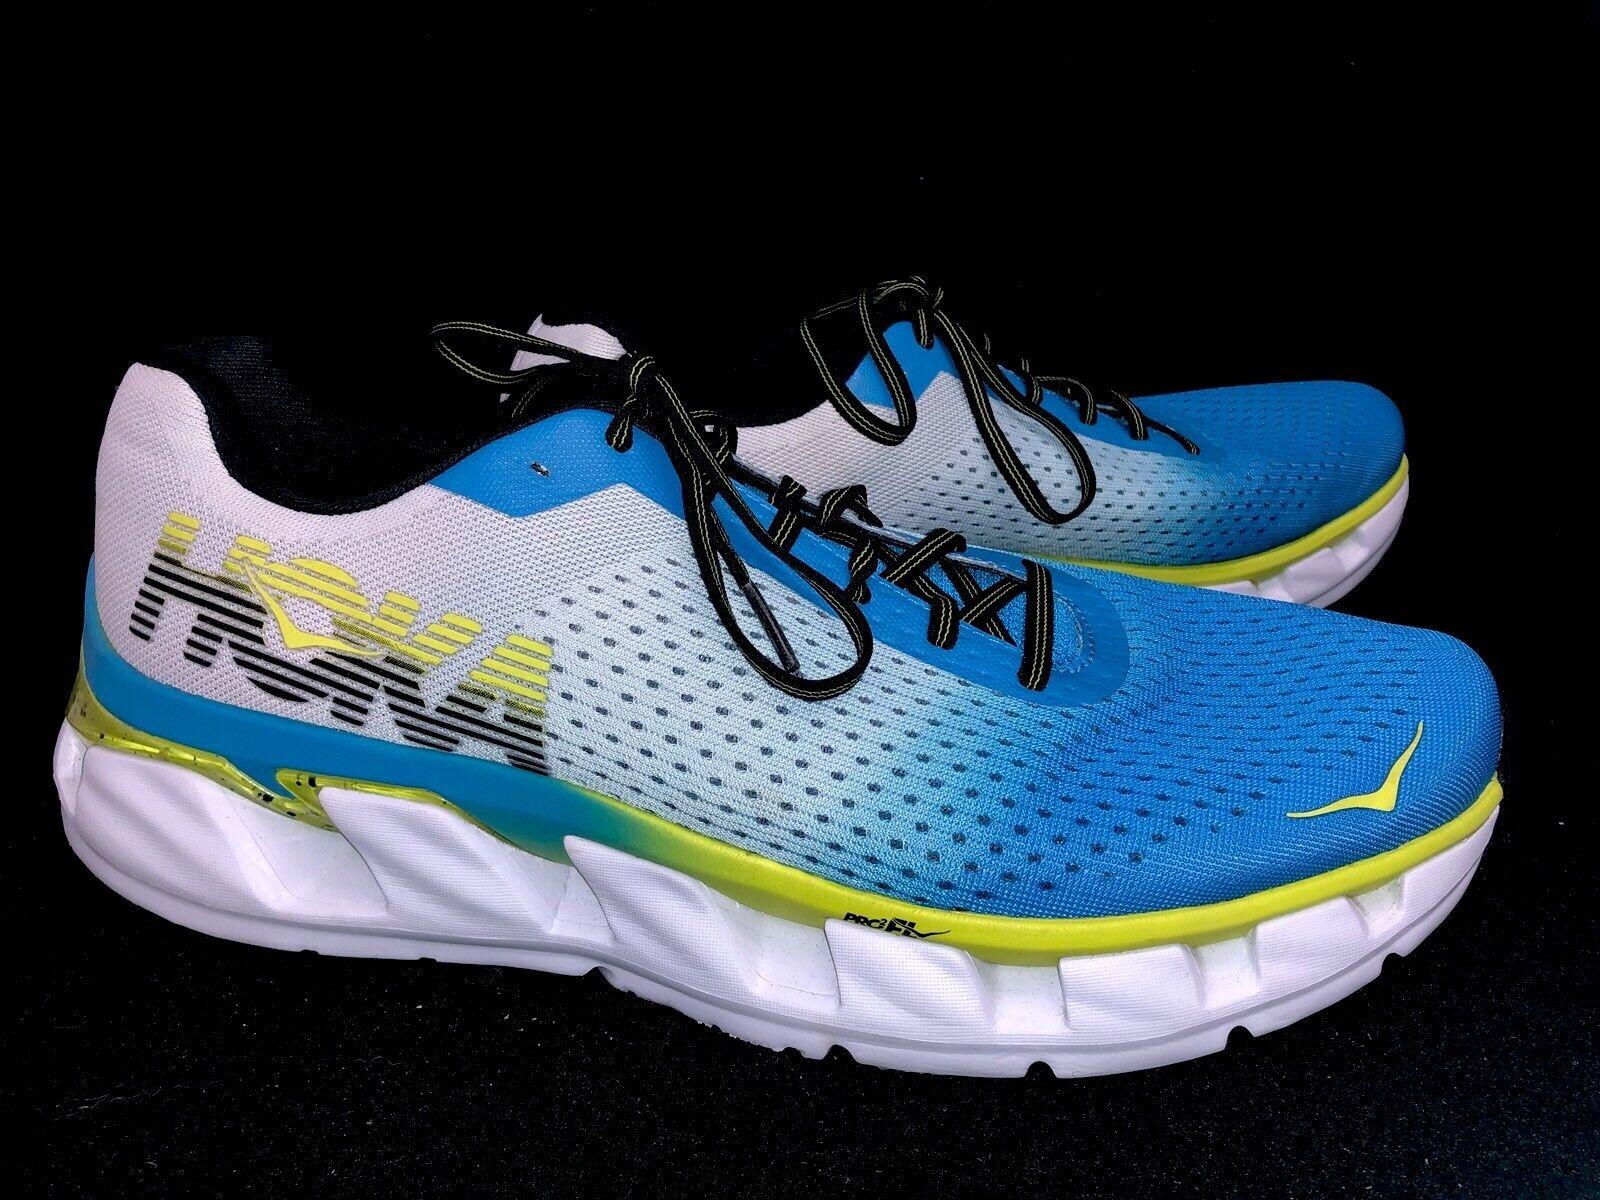 HOKA ONE ONE Elevon Men's running tennis shoes Lace Up Diva Blue / Sulphur